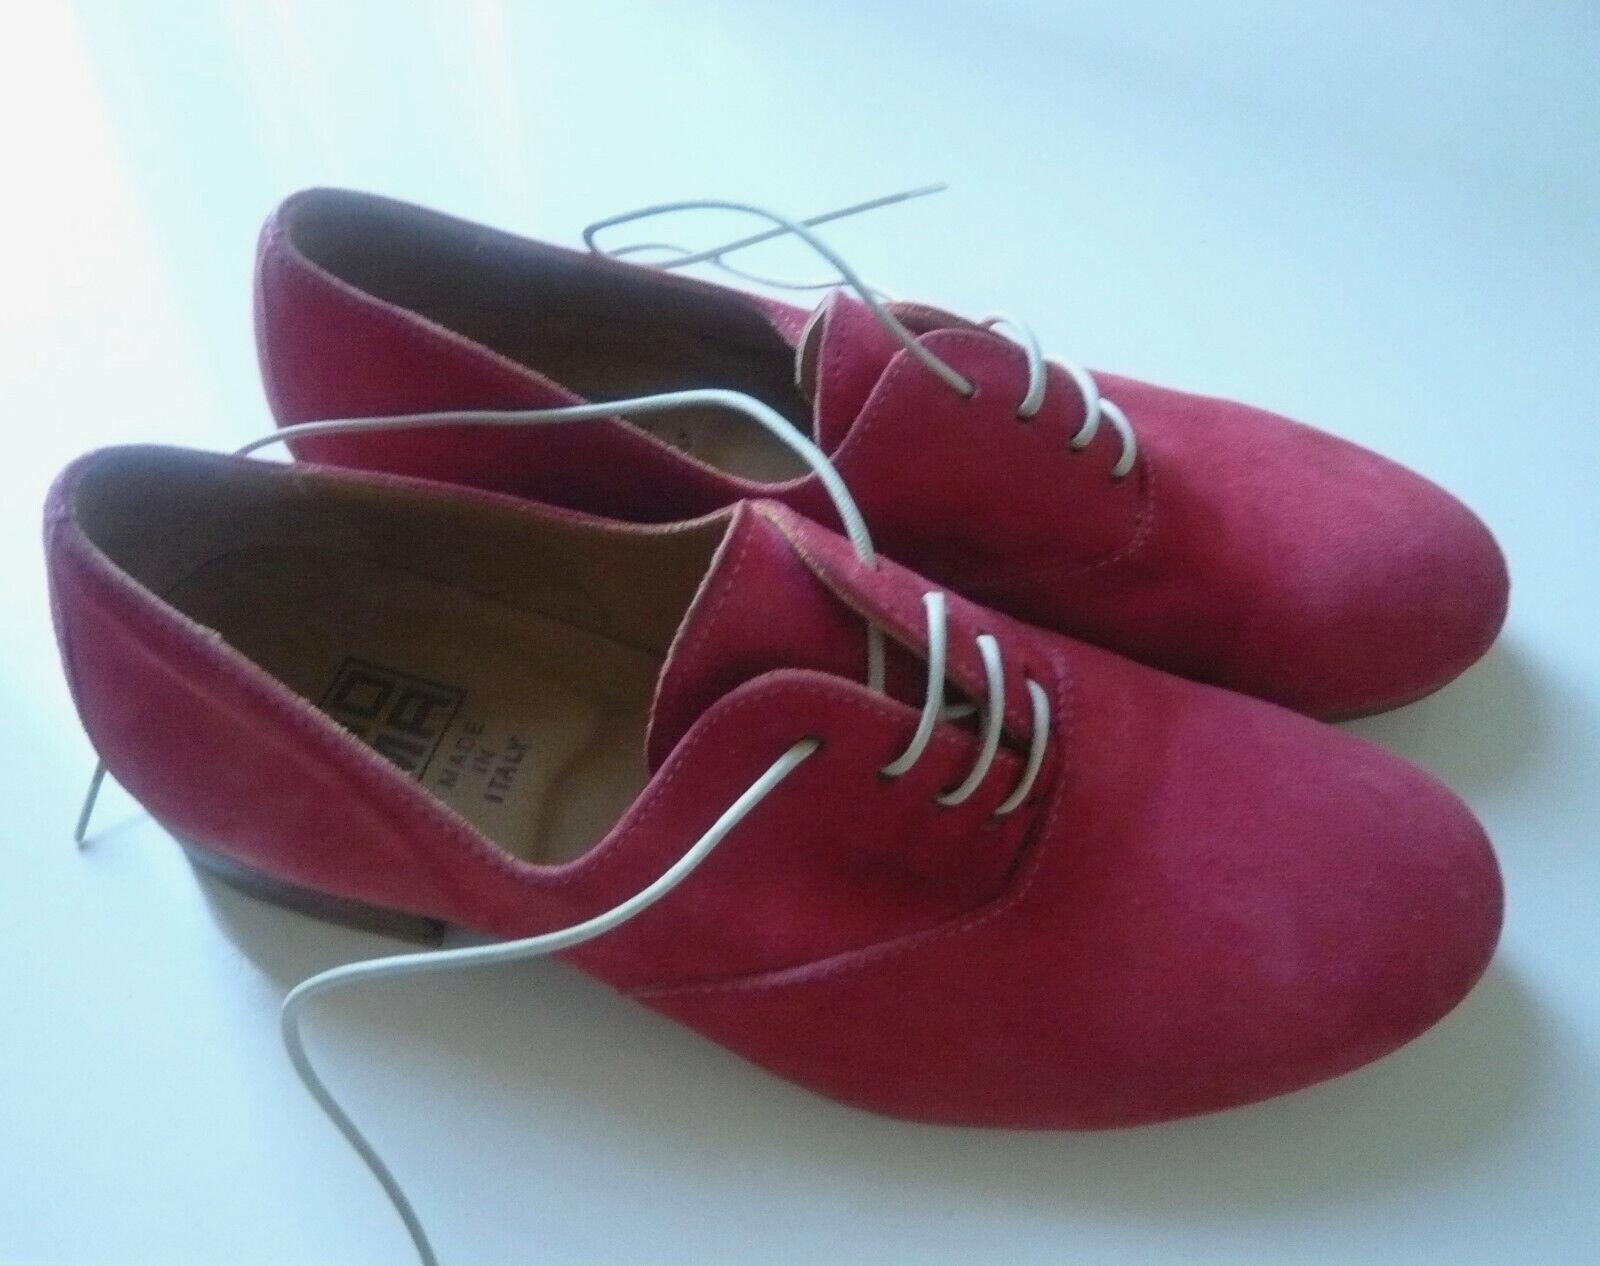 MOMA Schuhe Veloursleder rot Gr. 37 Damen Schnürschuhe